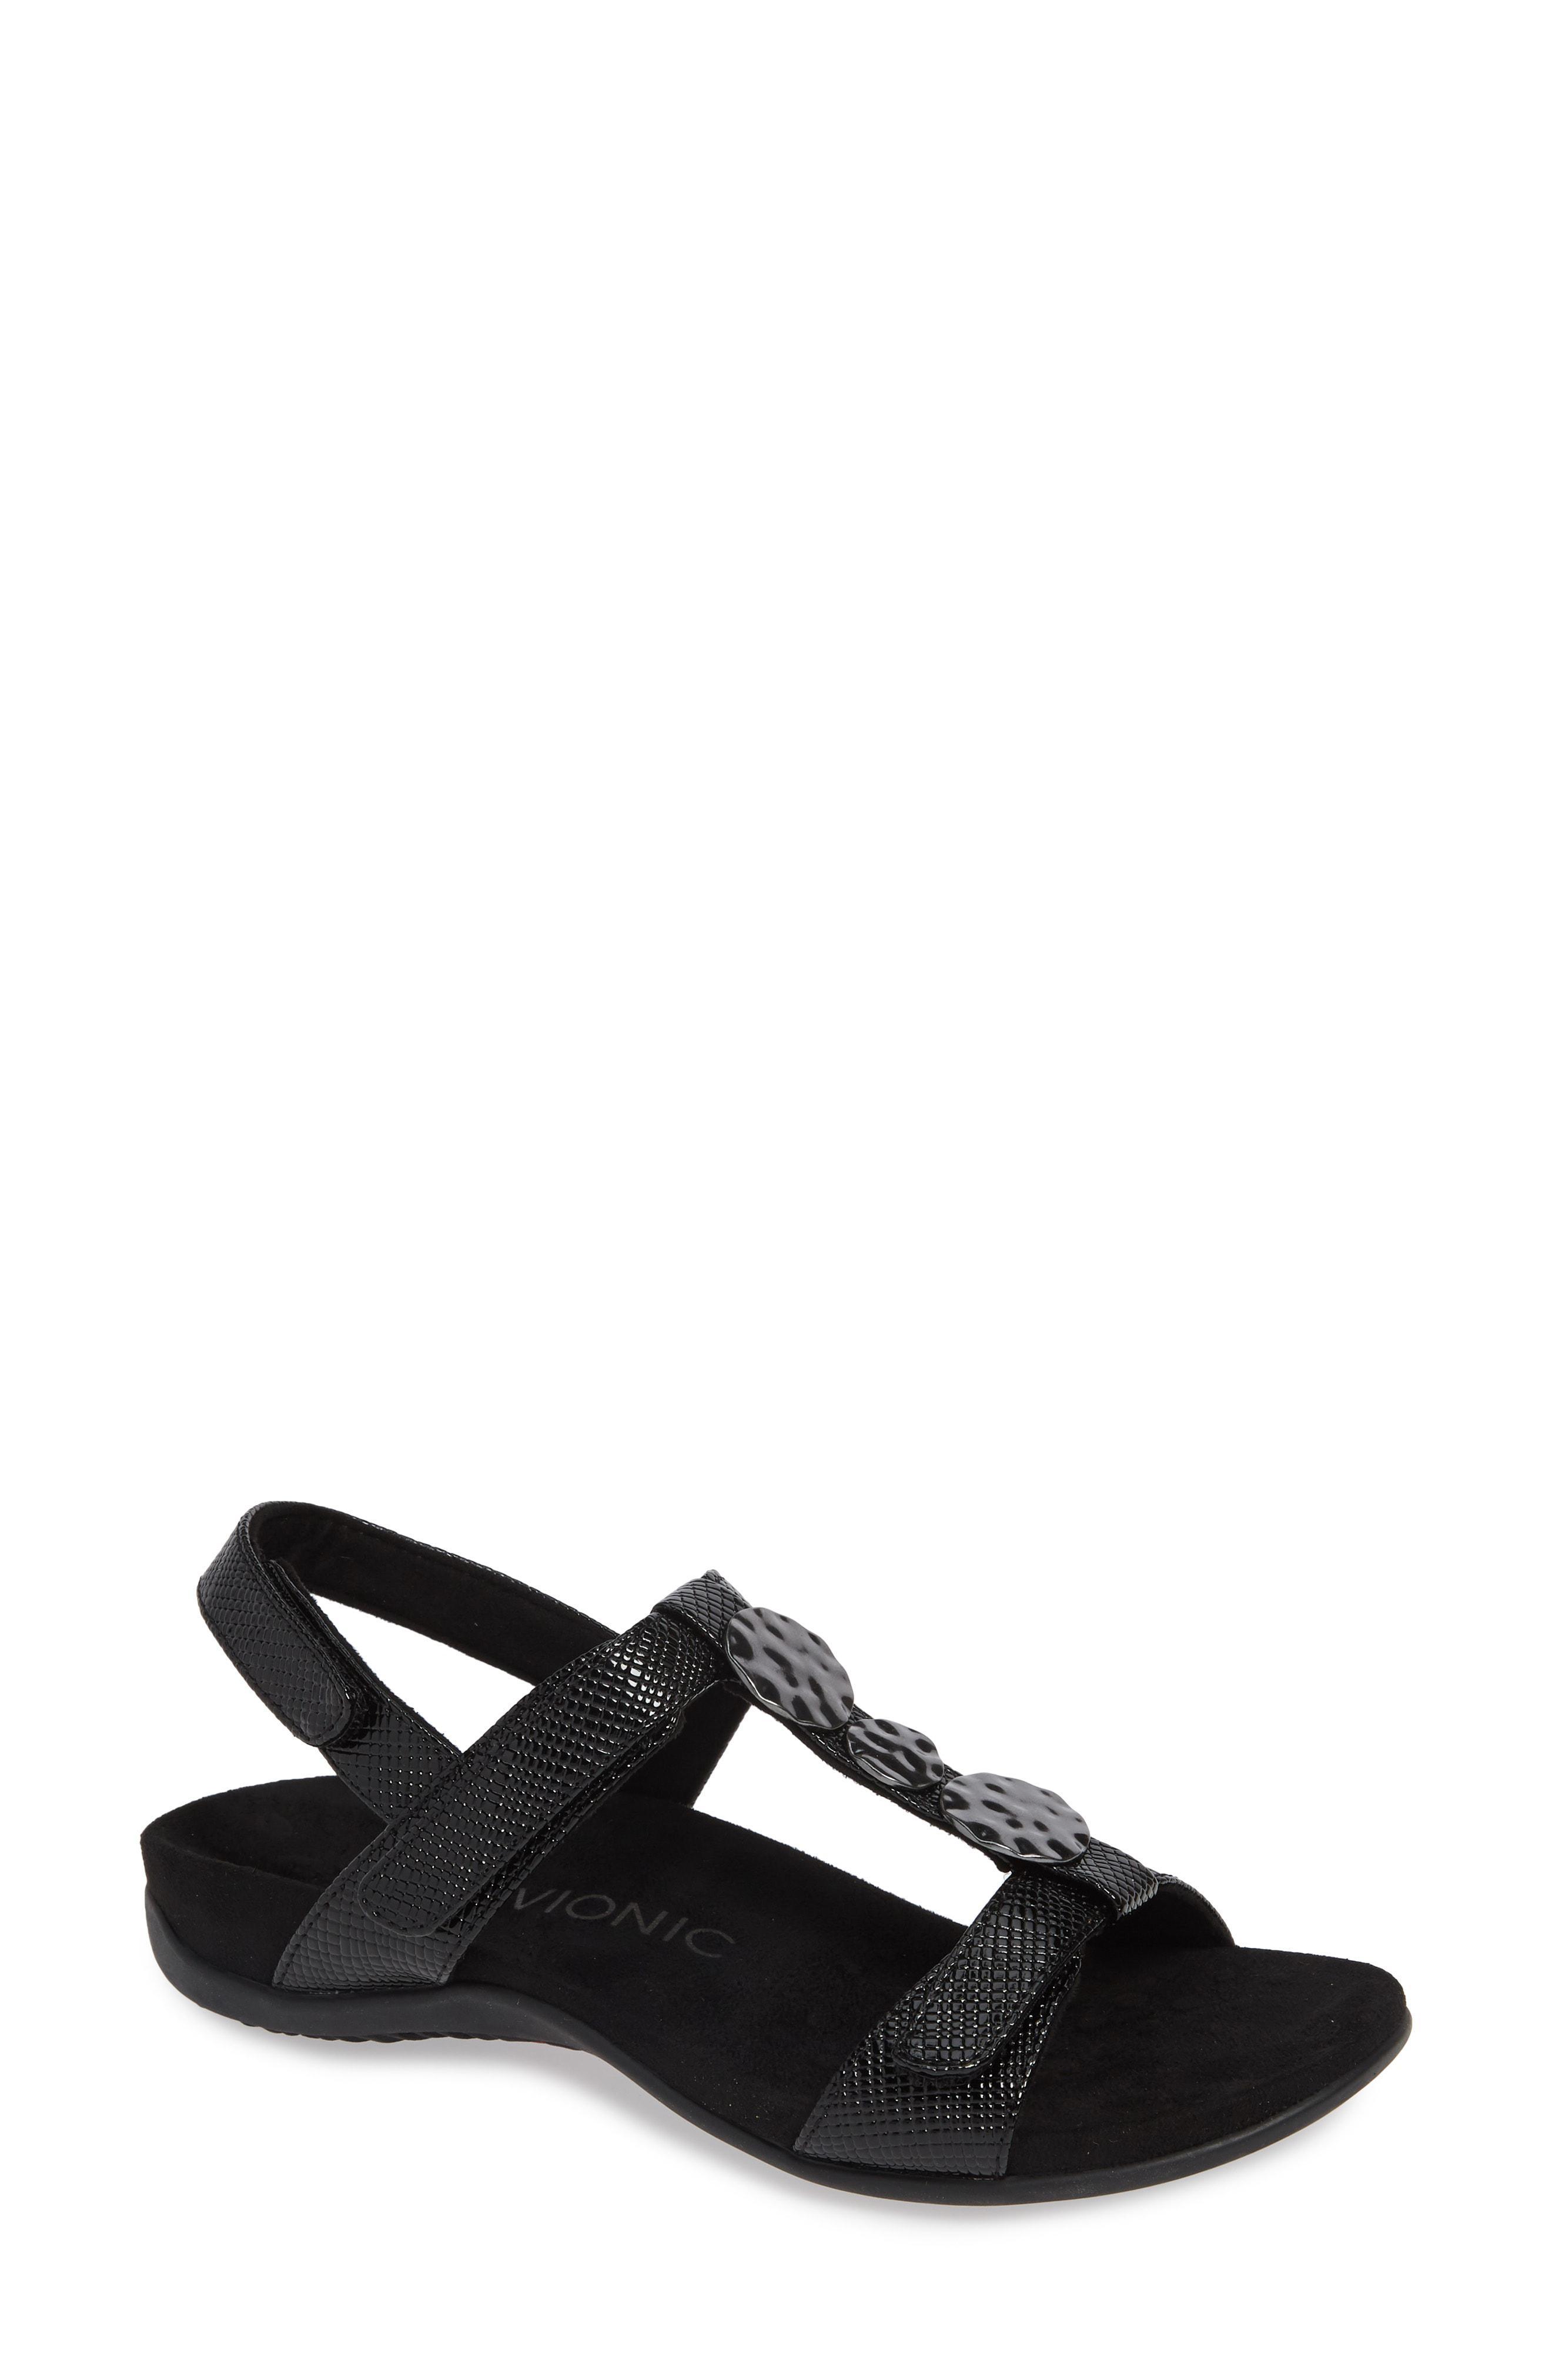 8768ad6b1597 Lyst - Vionic Farra Orthaheel Sandal in Black